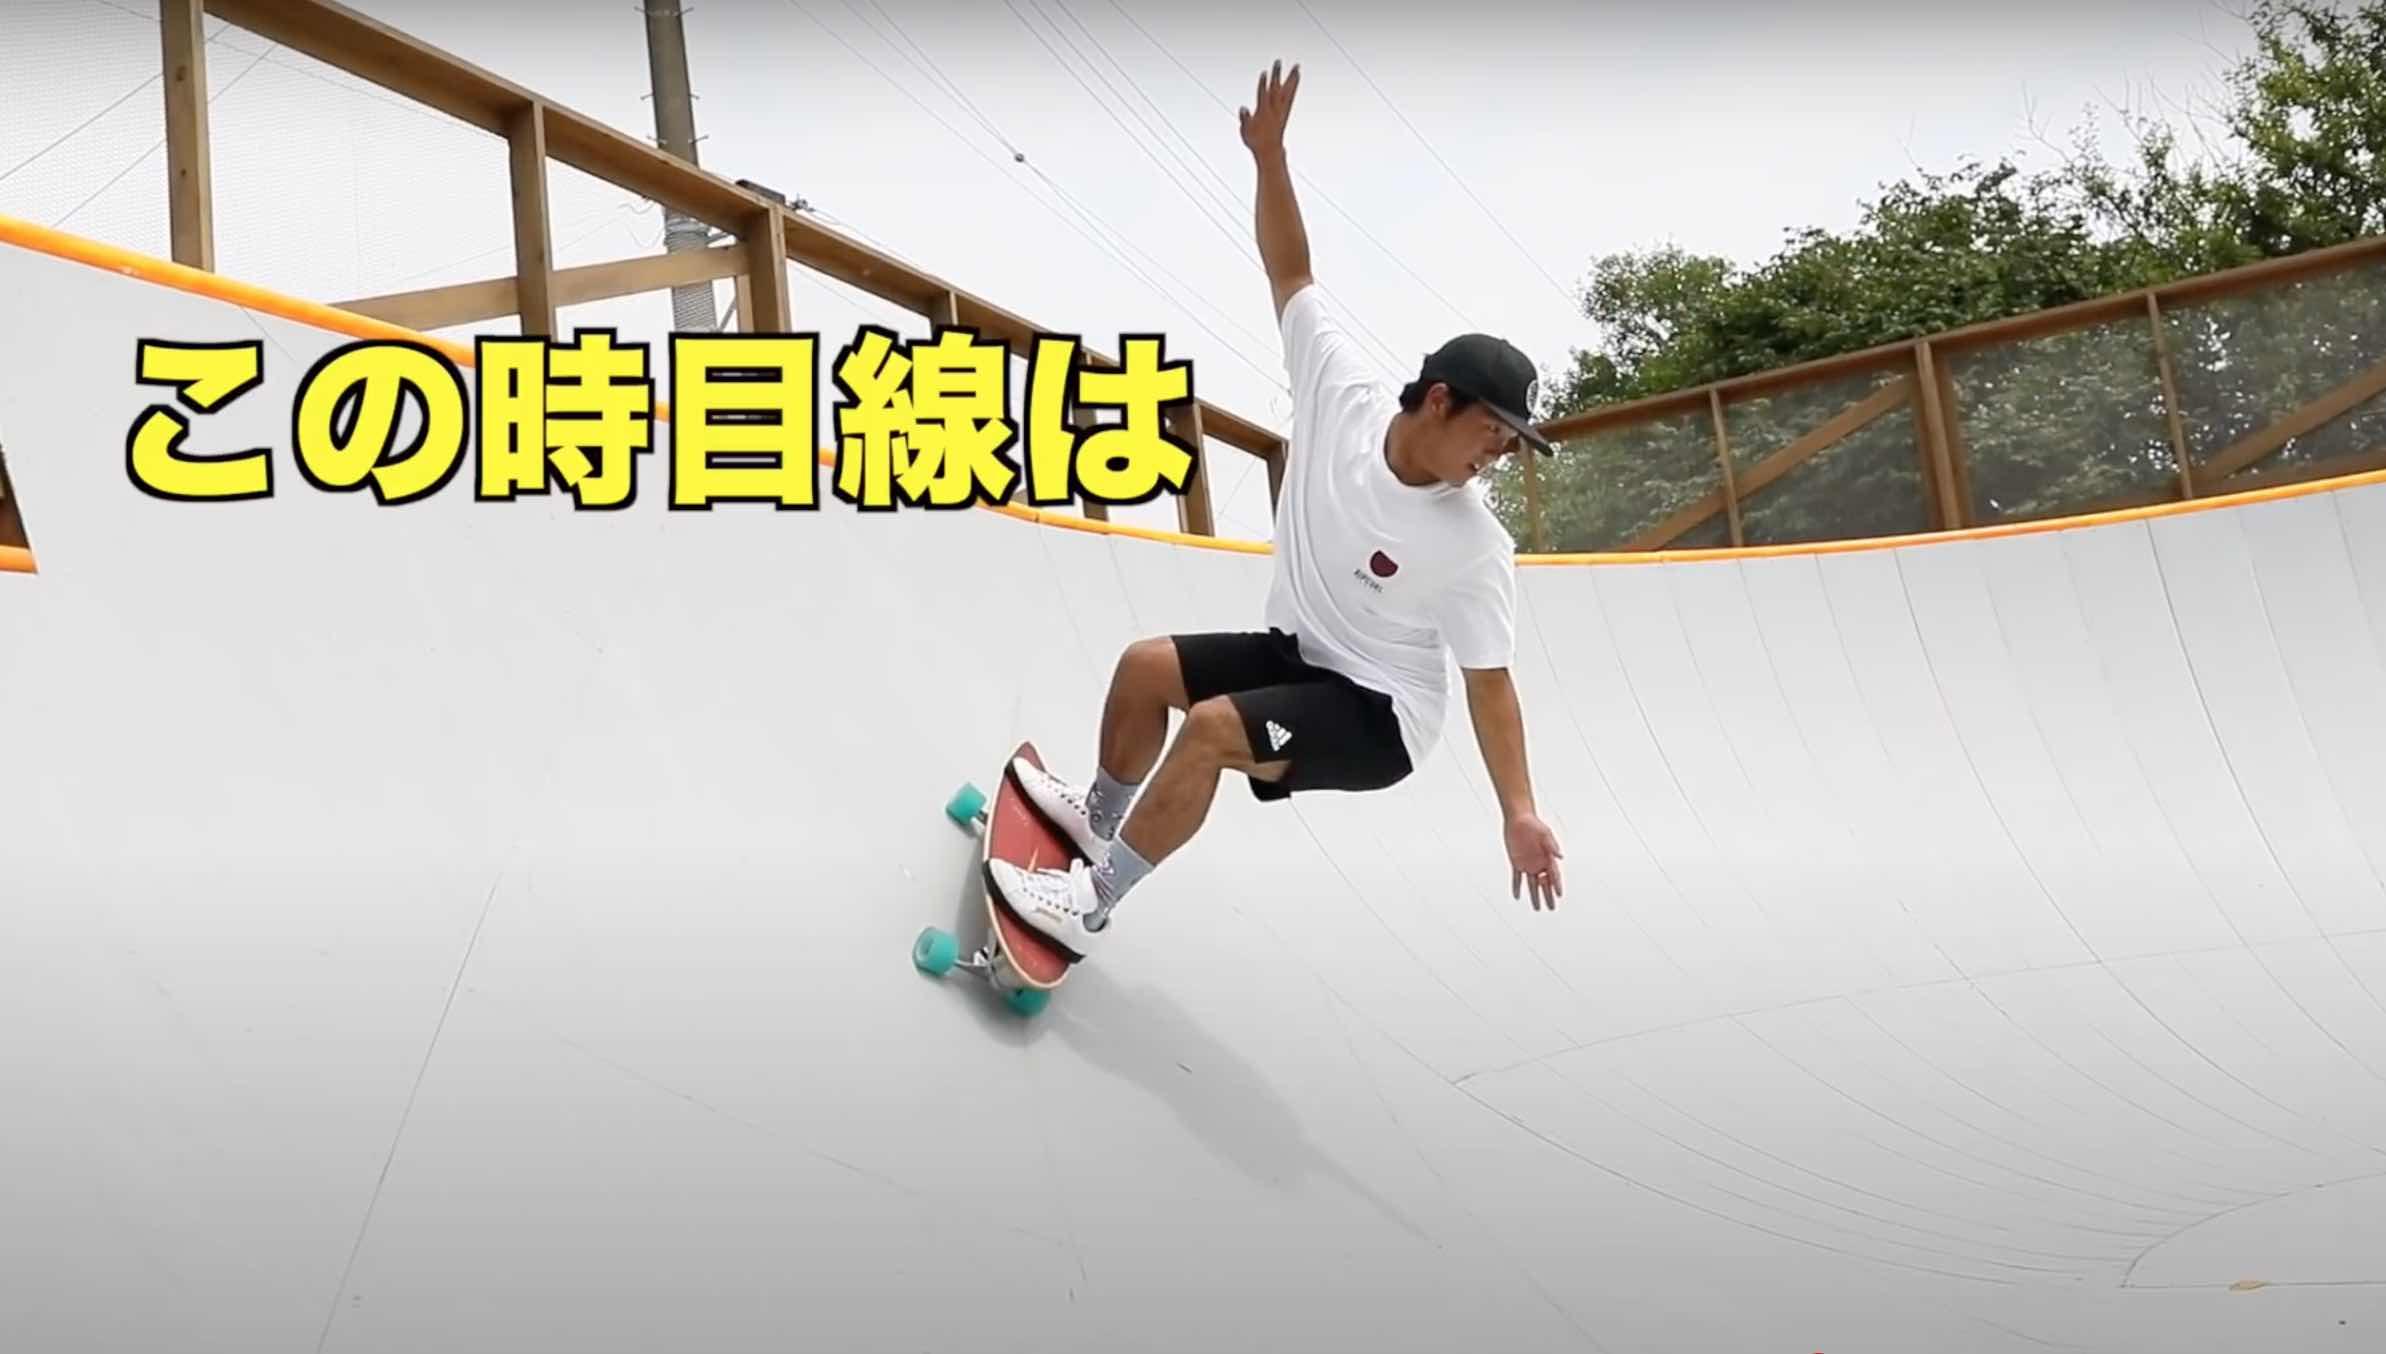 【How to】腕の角度を変えるだけでカーヴィングのスピードが2倍アップ!? その方法を村田嵐が伝授!!